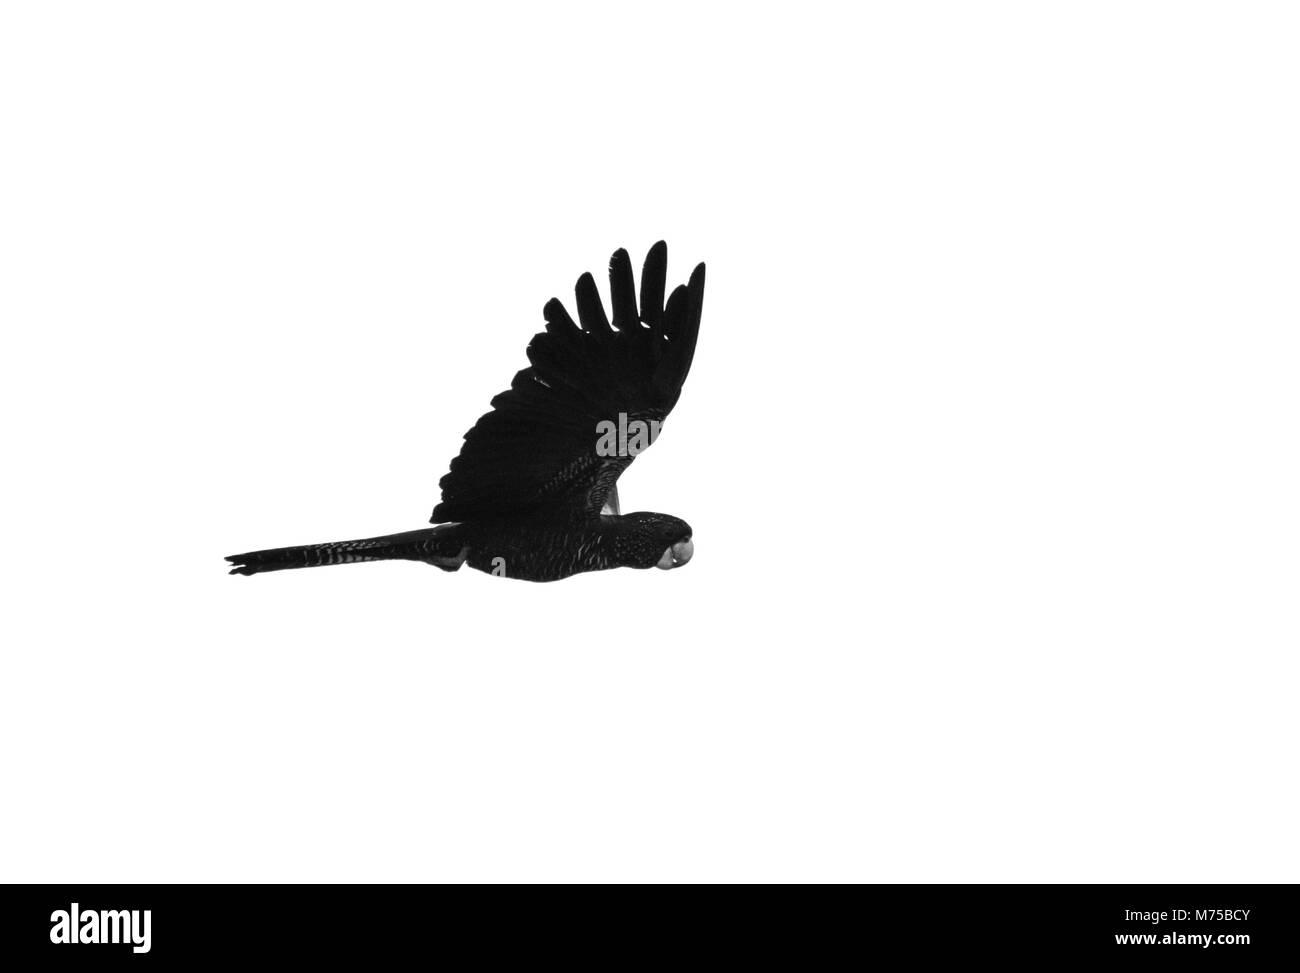 Glossy Black-Cockatoo, Calyptorhynchus lathami - Stock Image